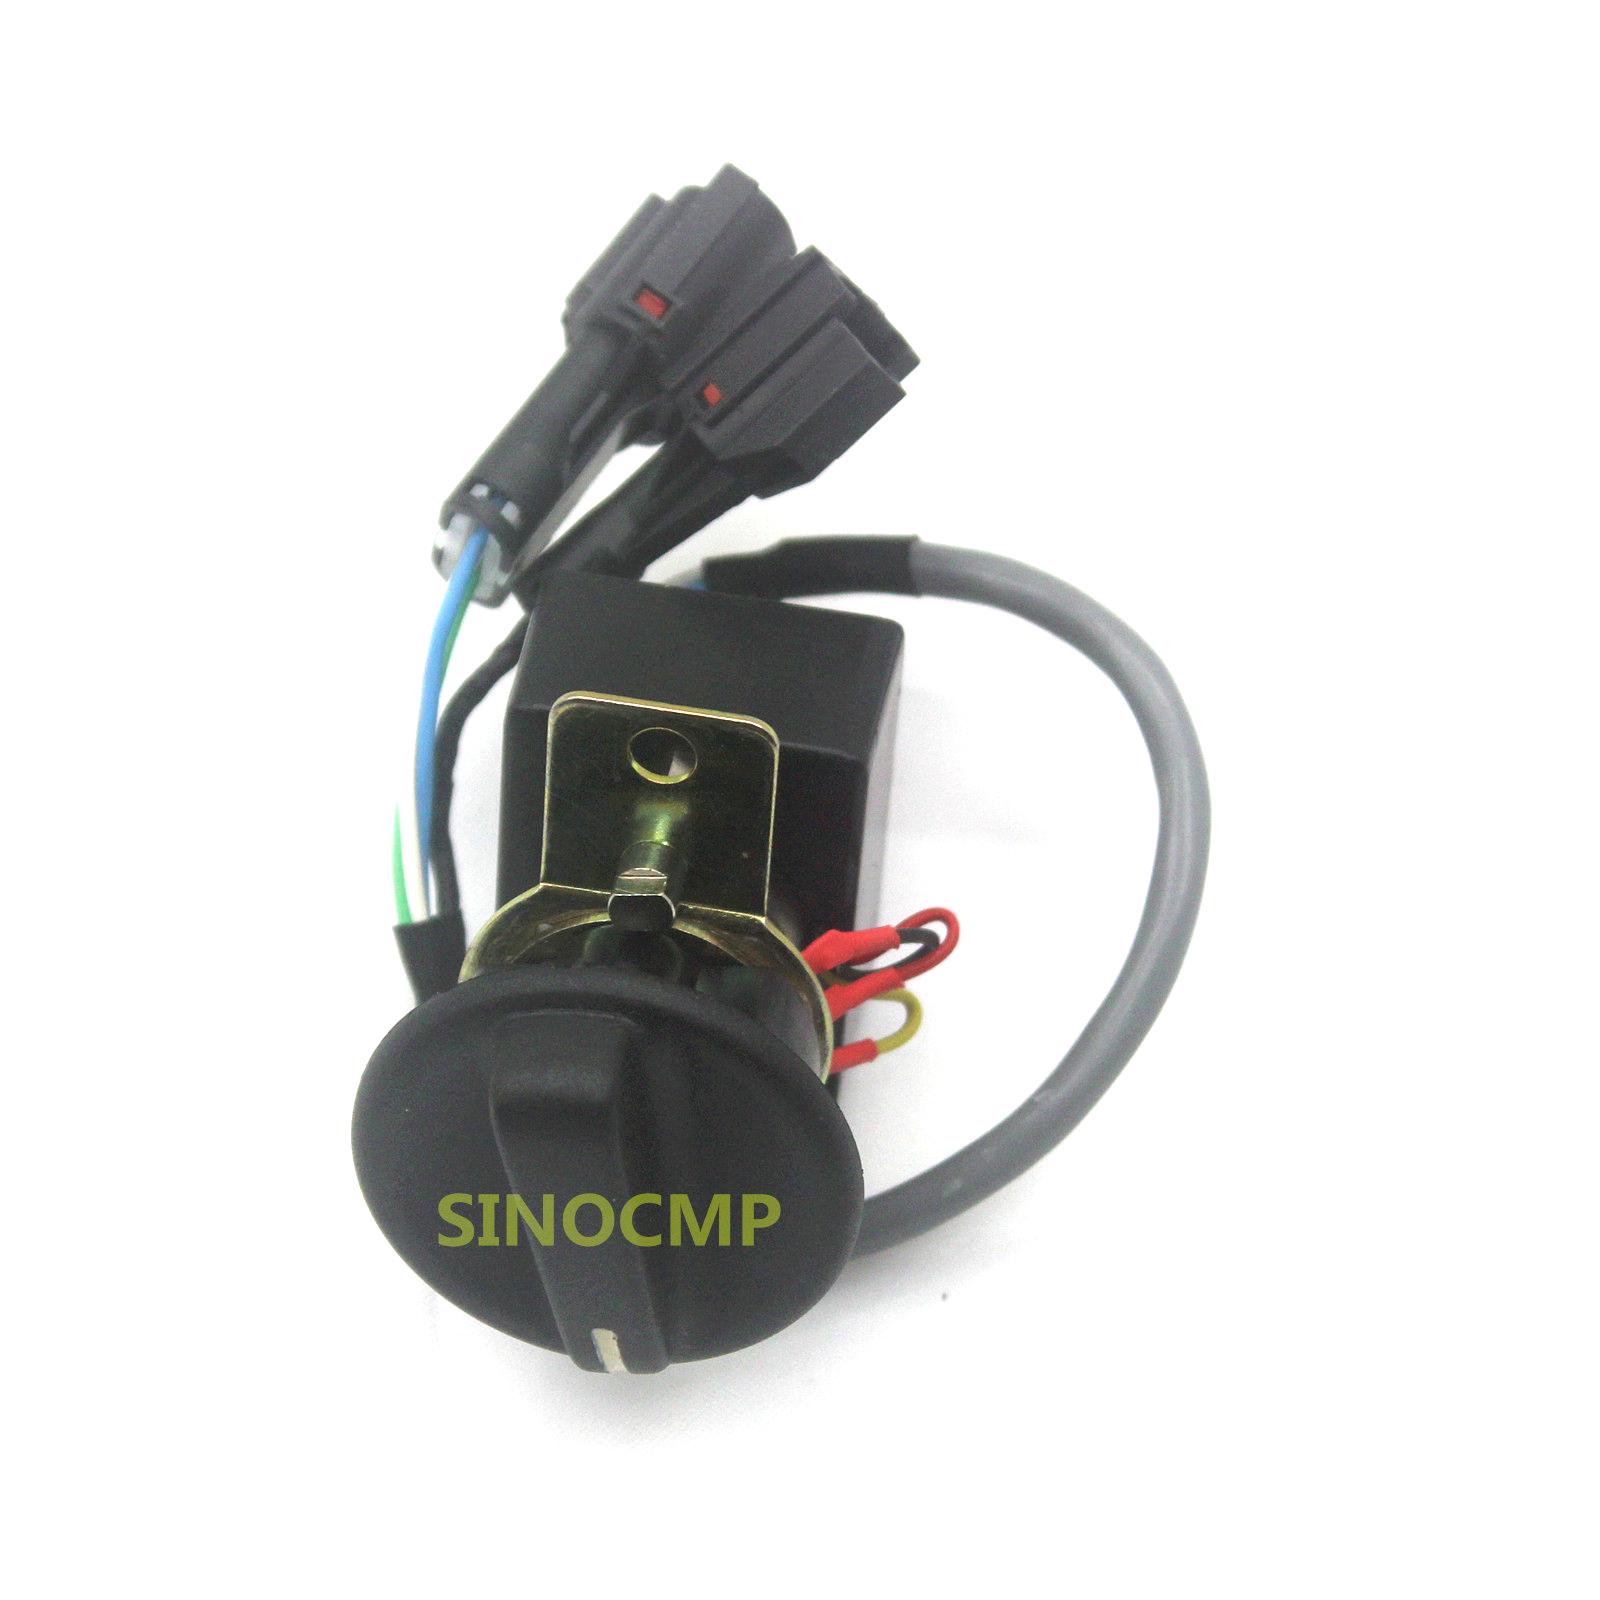 Fuel Selector Switch VOE 14503037 For Volvo EC140B EC160B EC210B Excavator